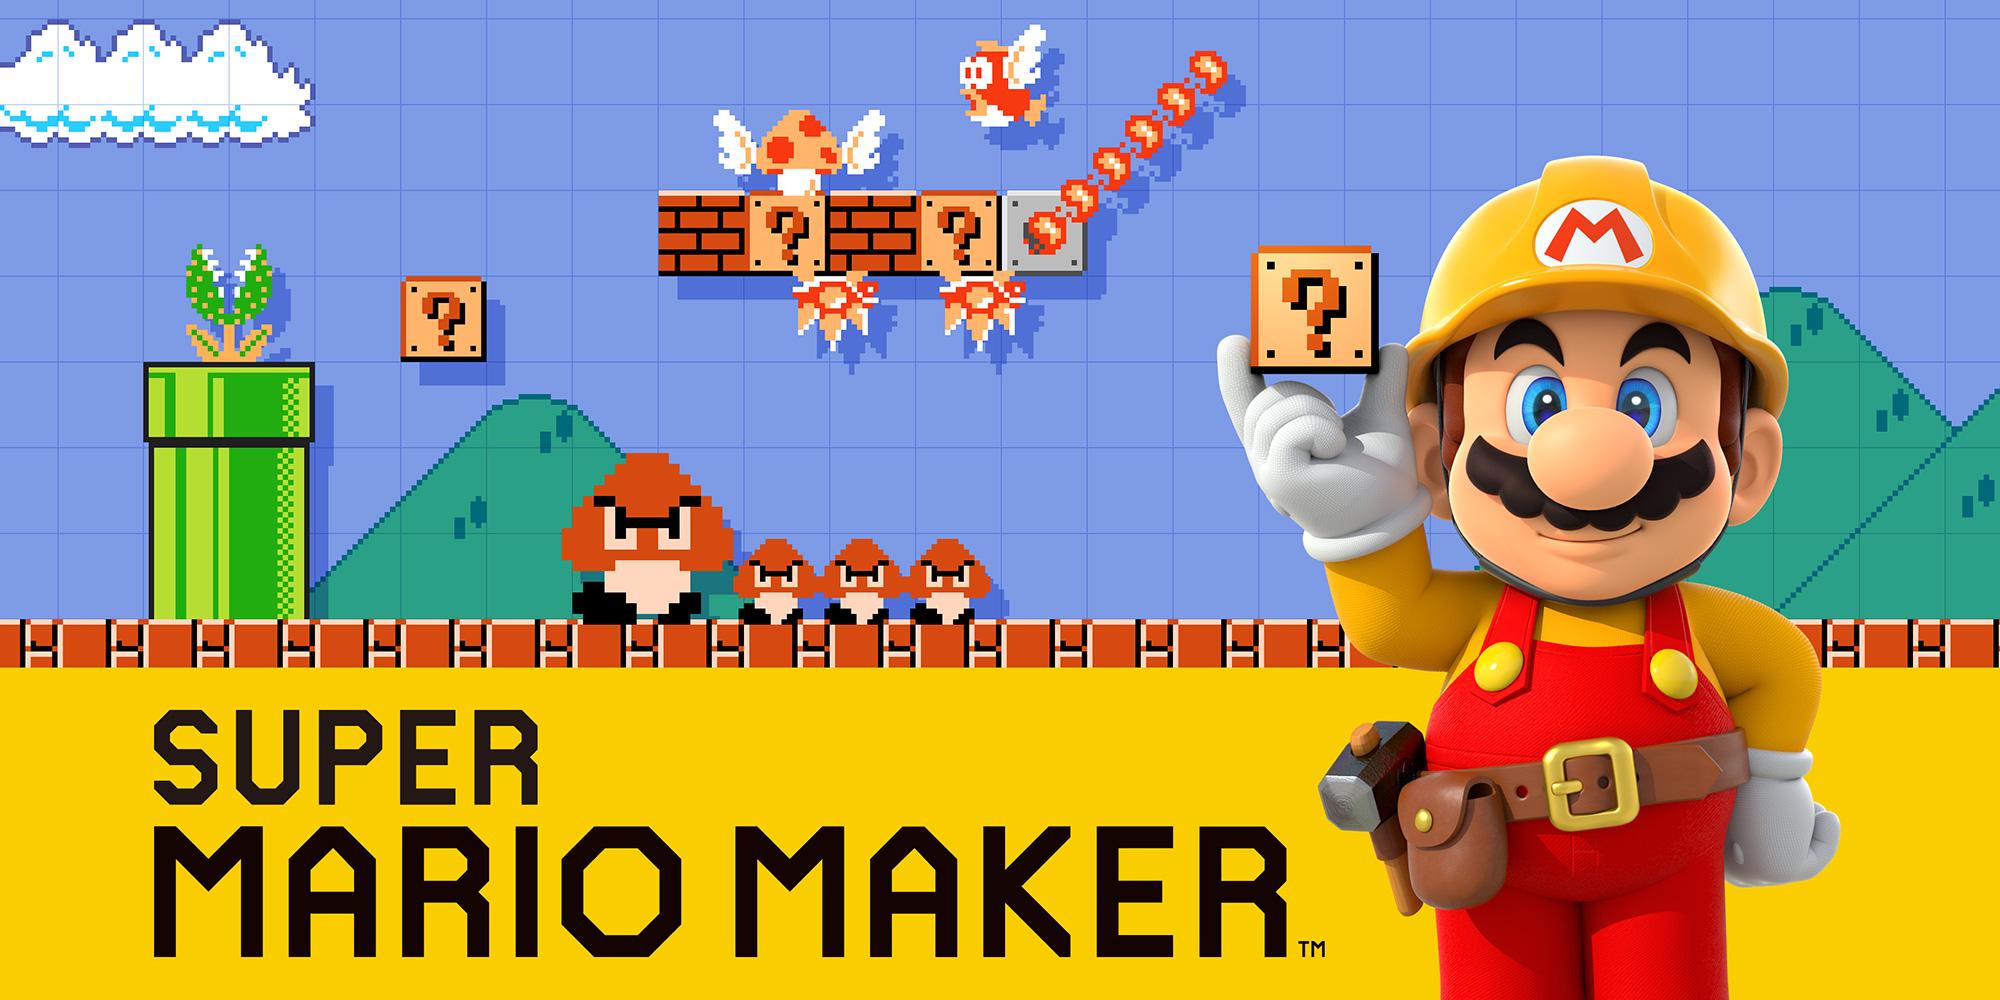 [Wii U] 6 millions de niveaux créés dans Super Mario Maker !